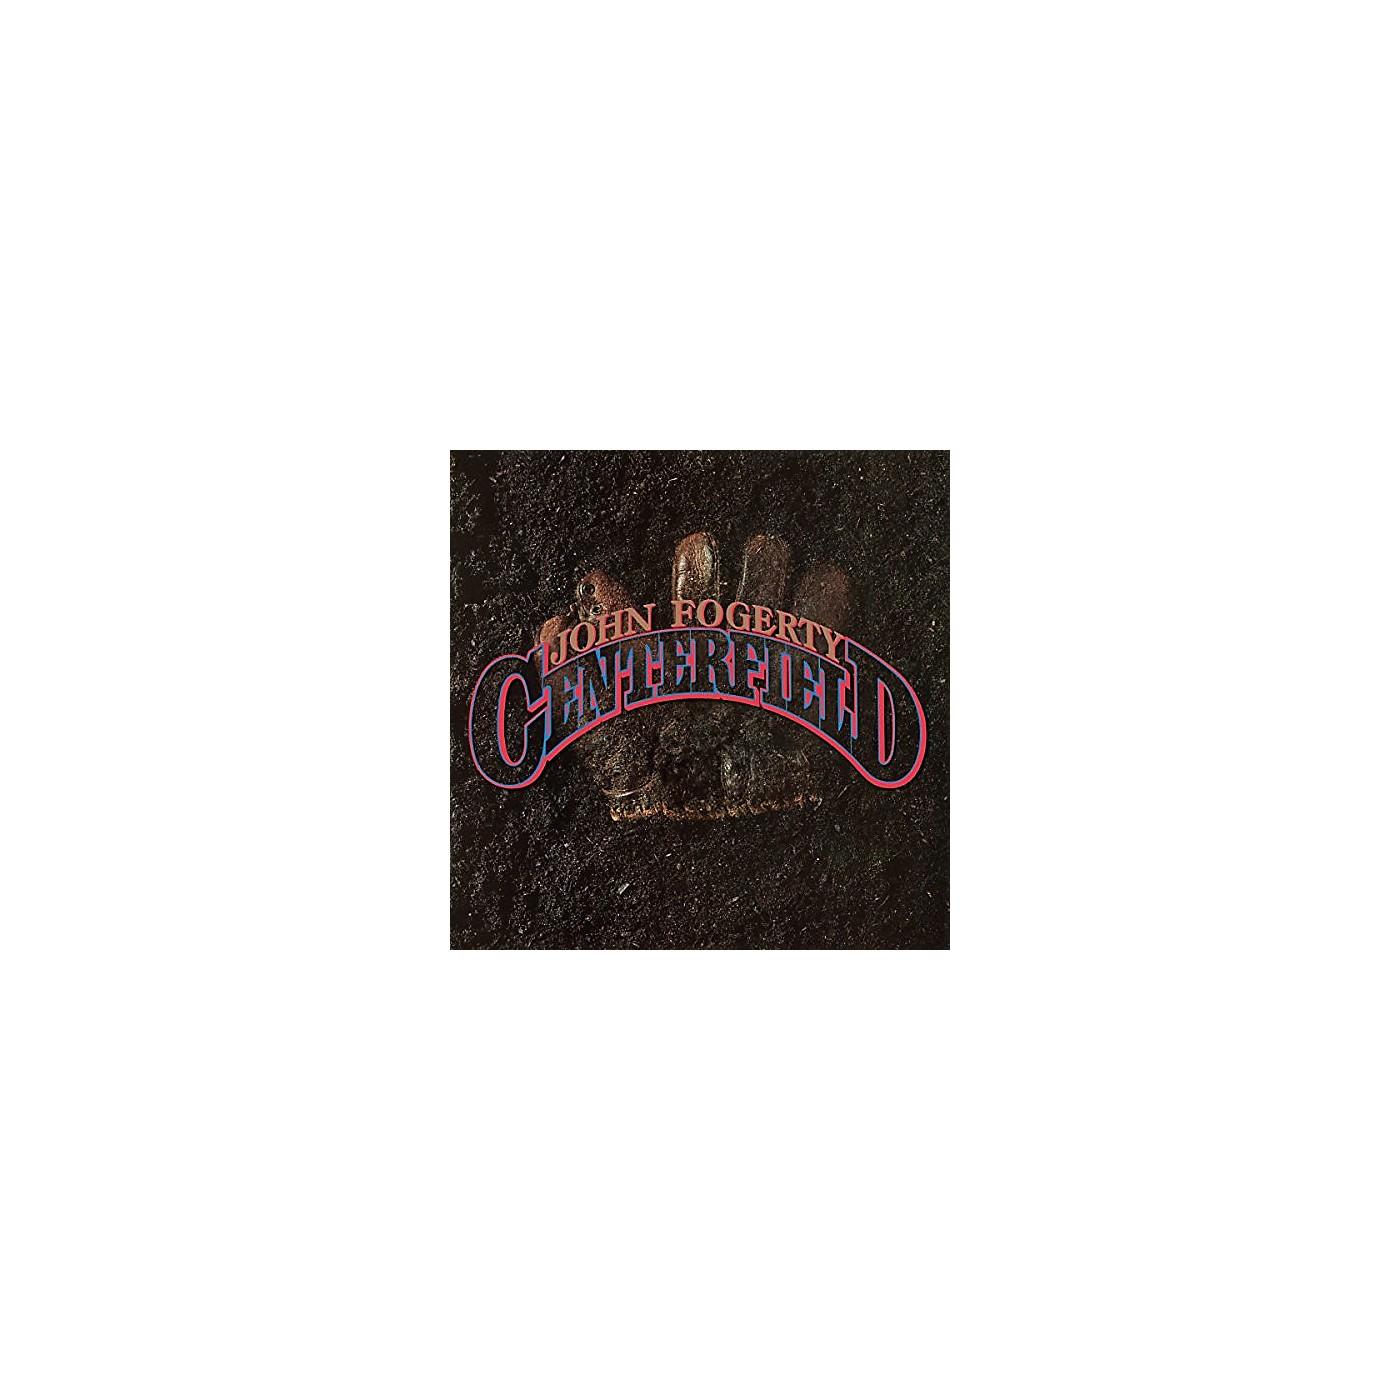 Alliance John Fogerty - Centerfield (CD) thumbnail